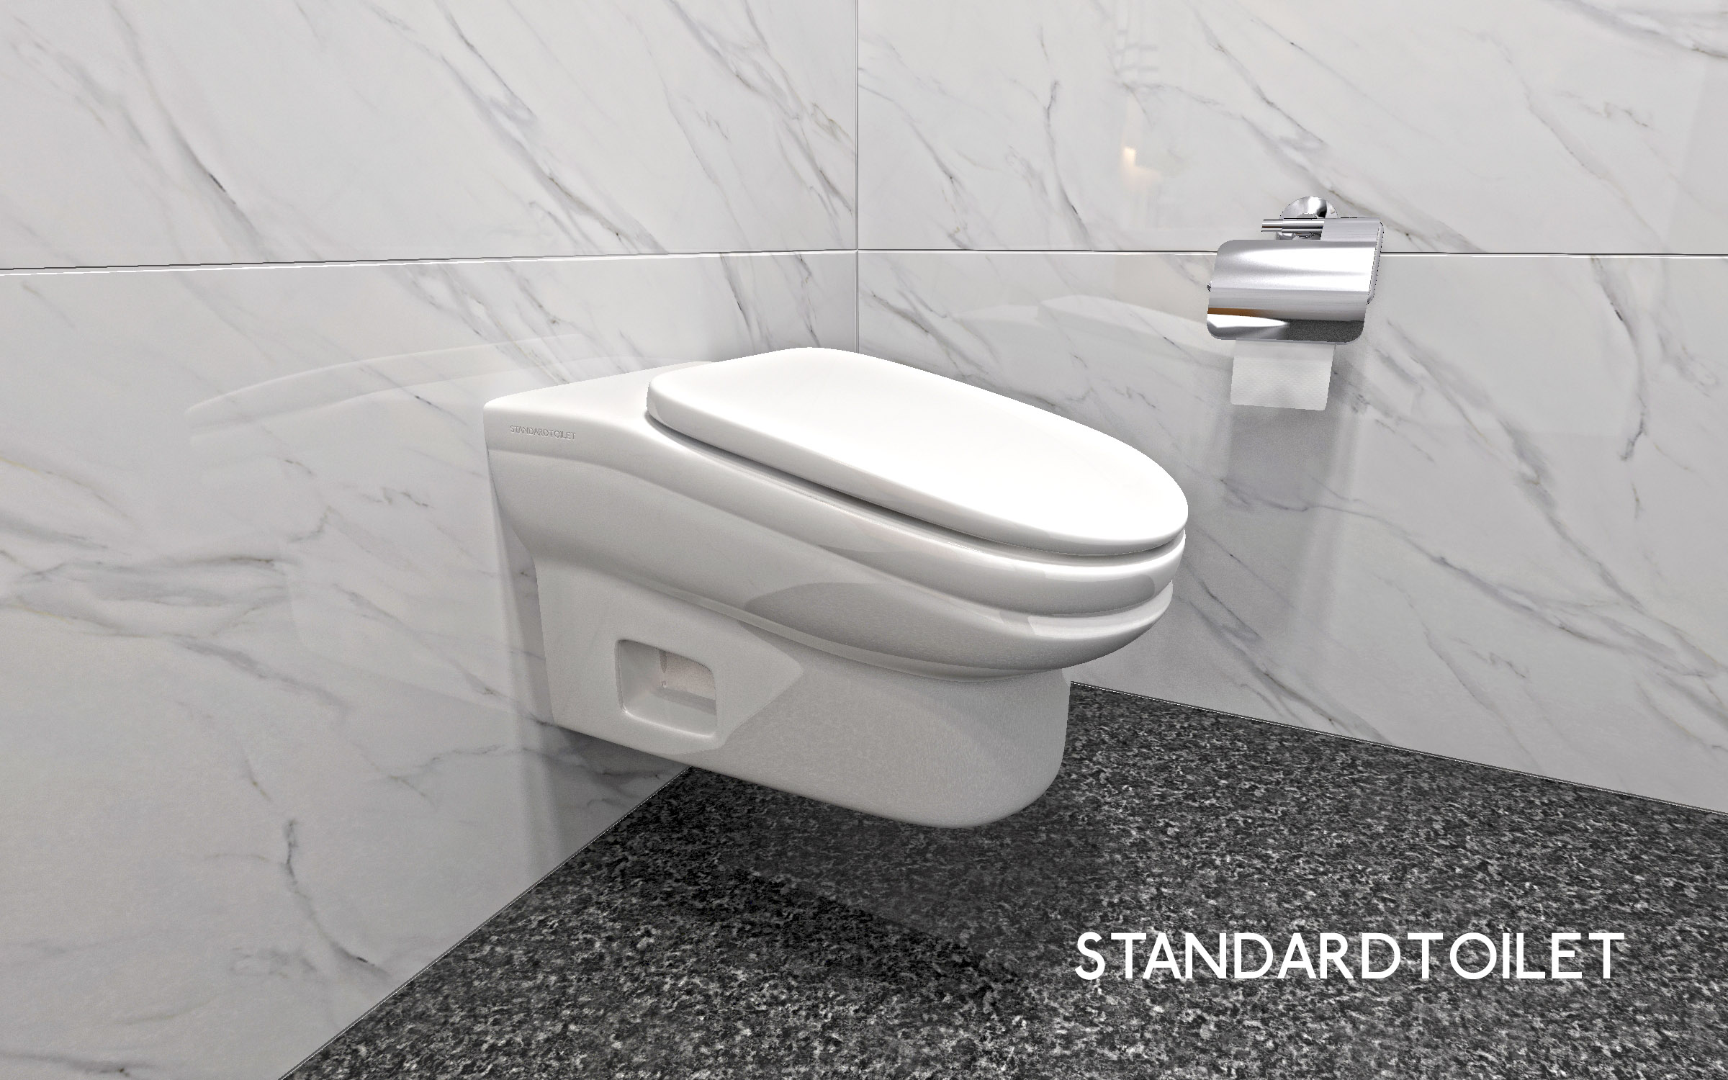 The StandardToilet is an uncomfortable toilet